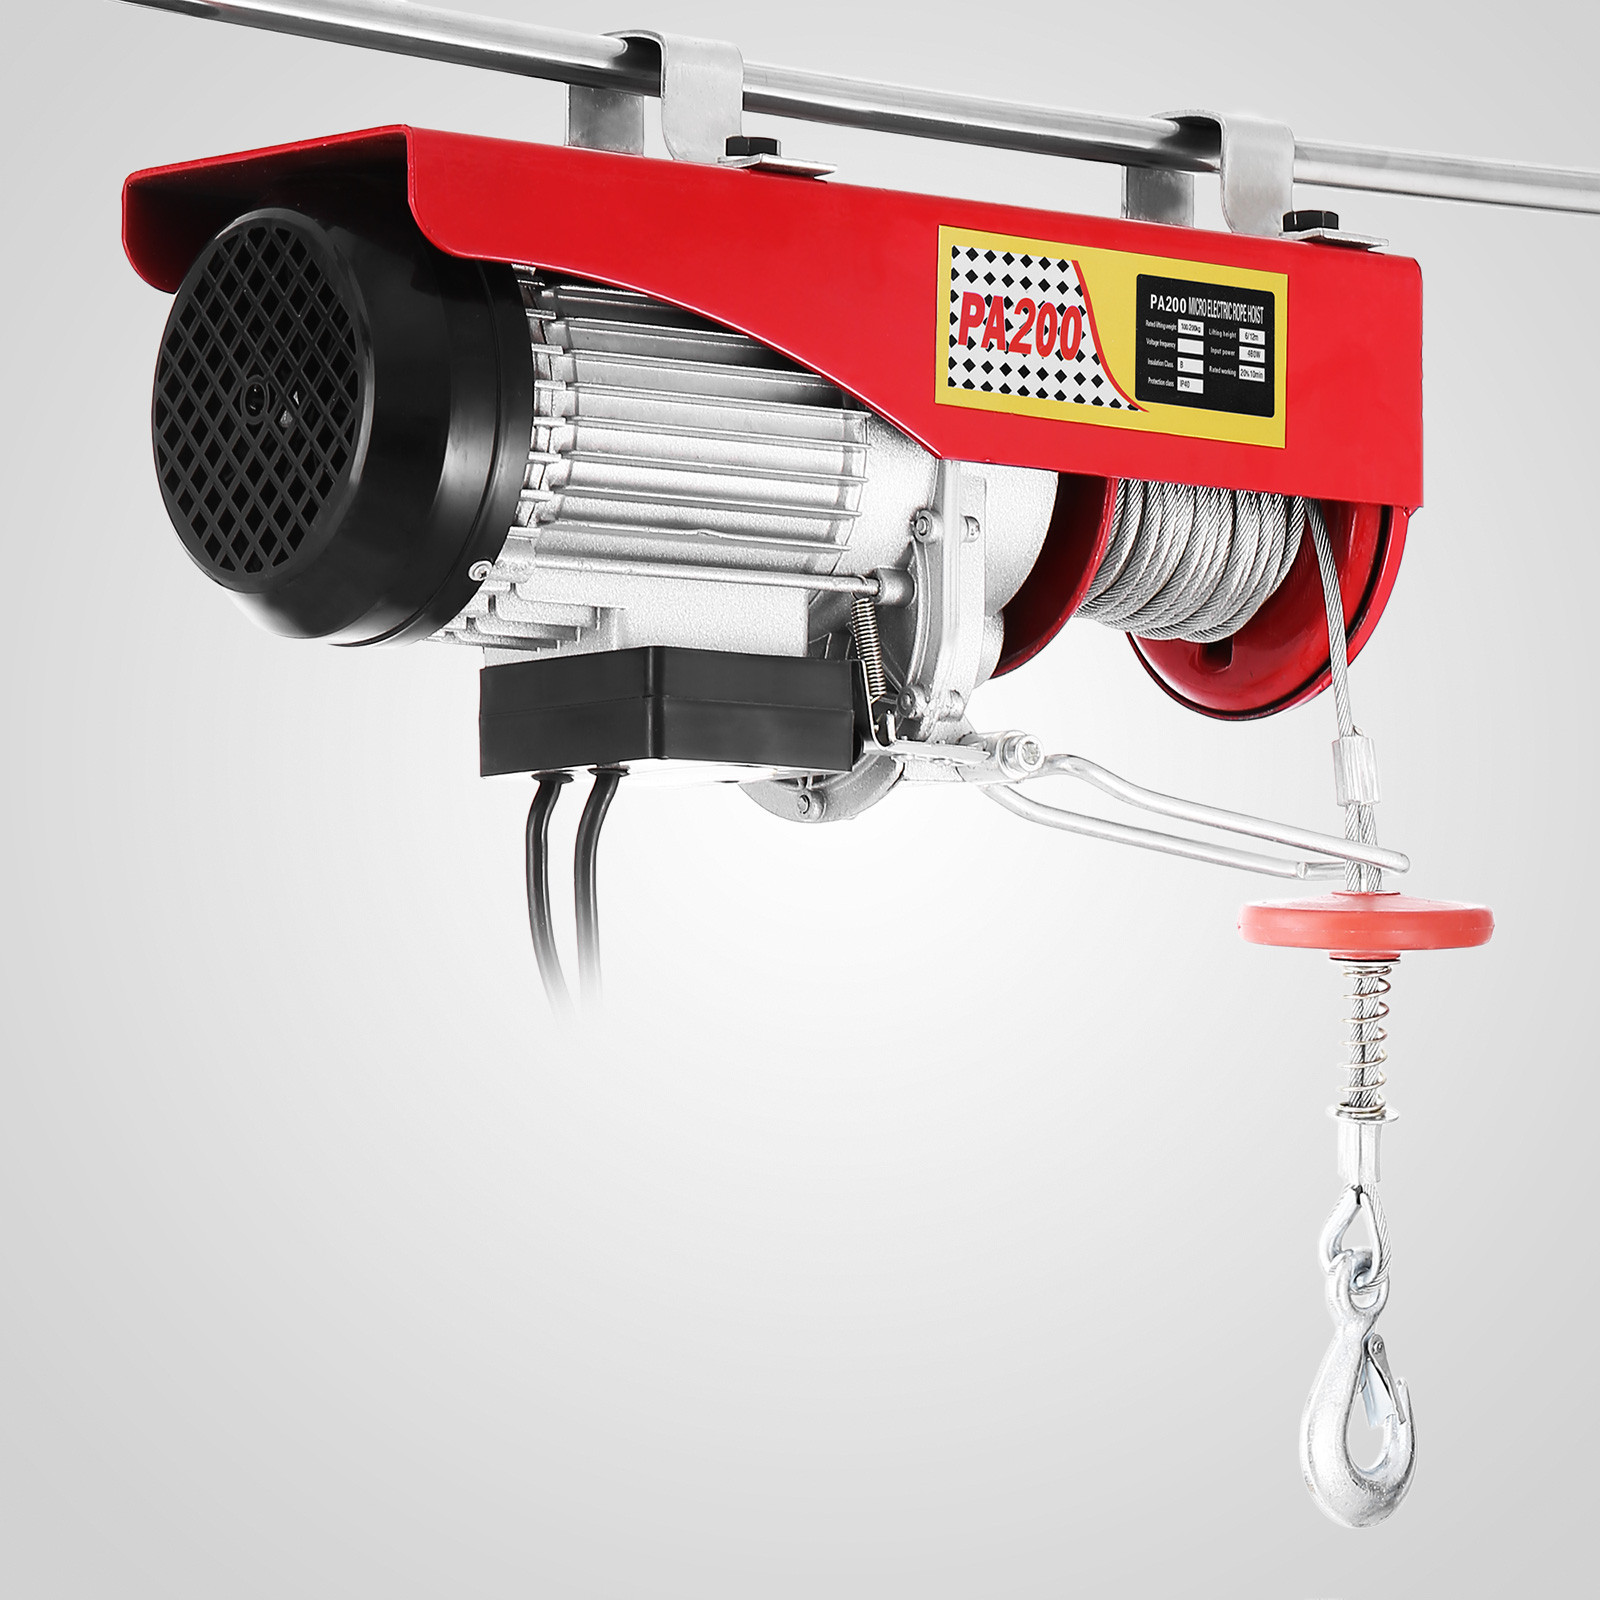 100kg-900kg-Electric-Hoist-Winch-Lifting-Engine-Crane-Cable-Lift-Hook-Garage miniature 17